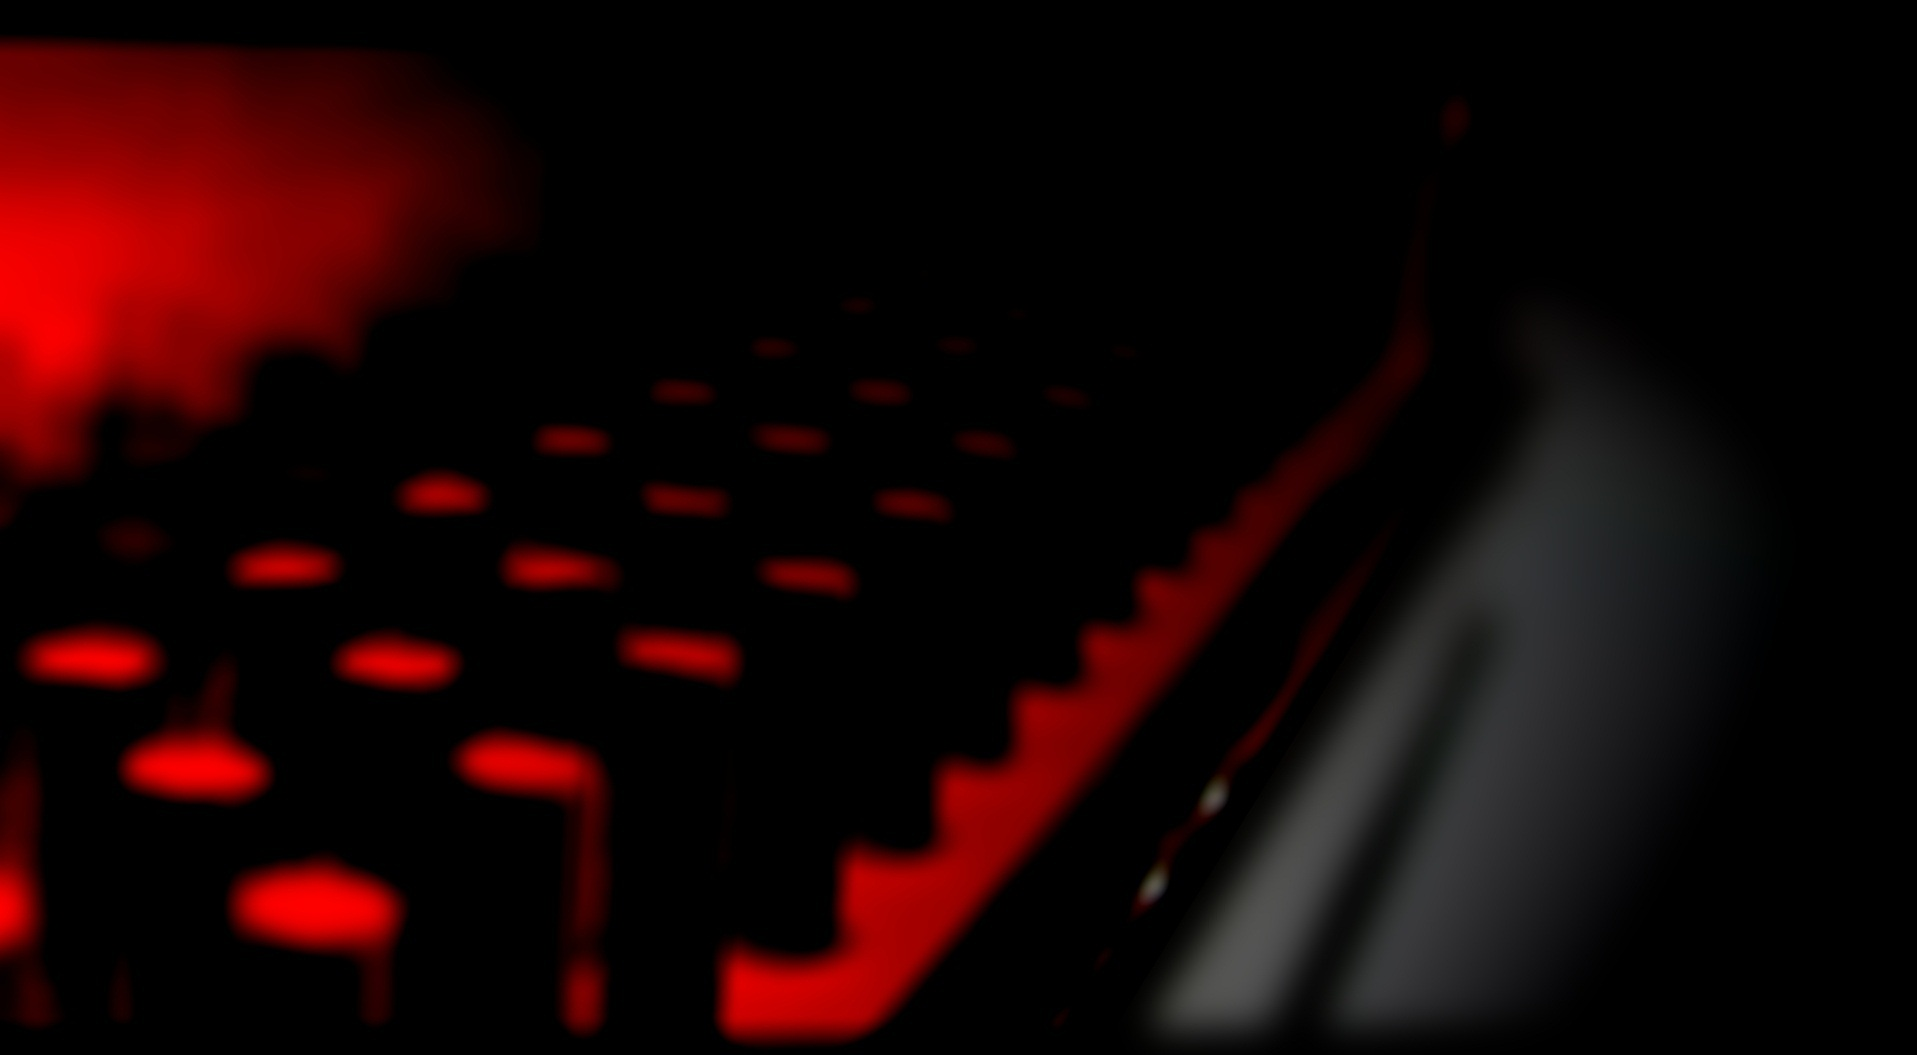 Black And Red Hd Wallpaper 5 Desktop Wallpaper ...